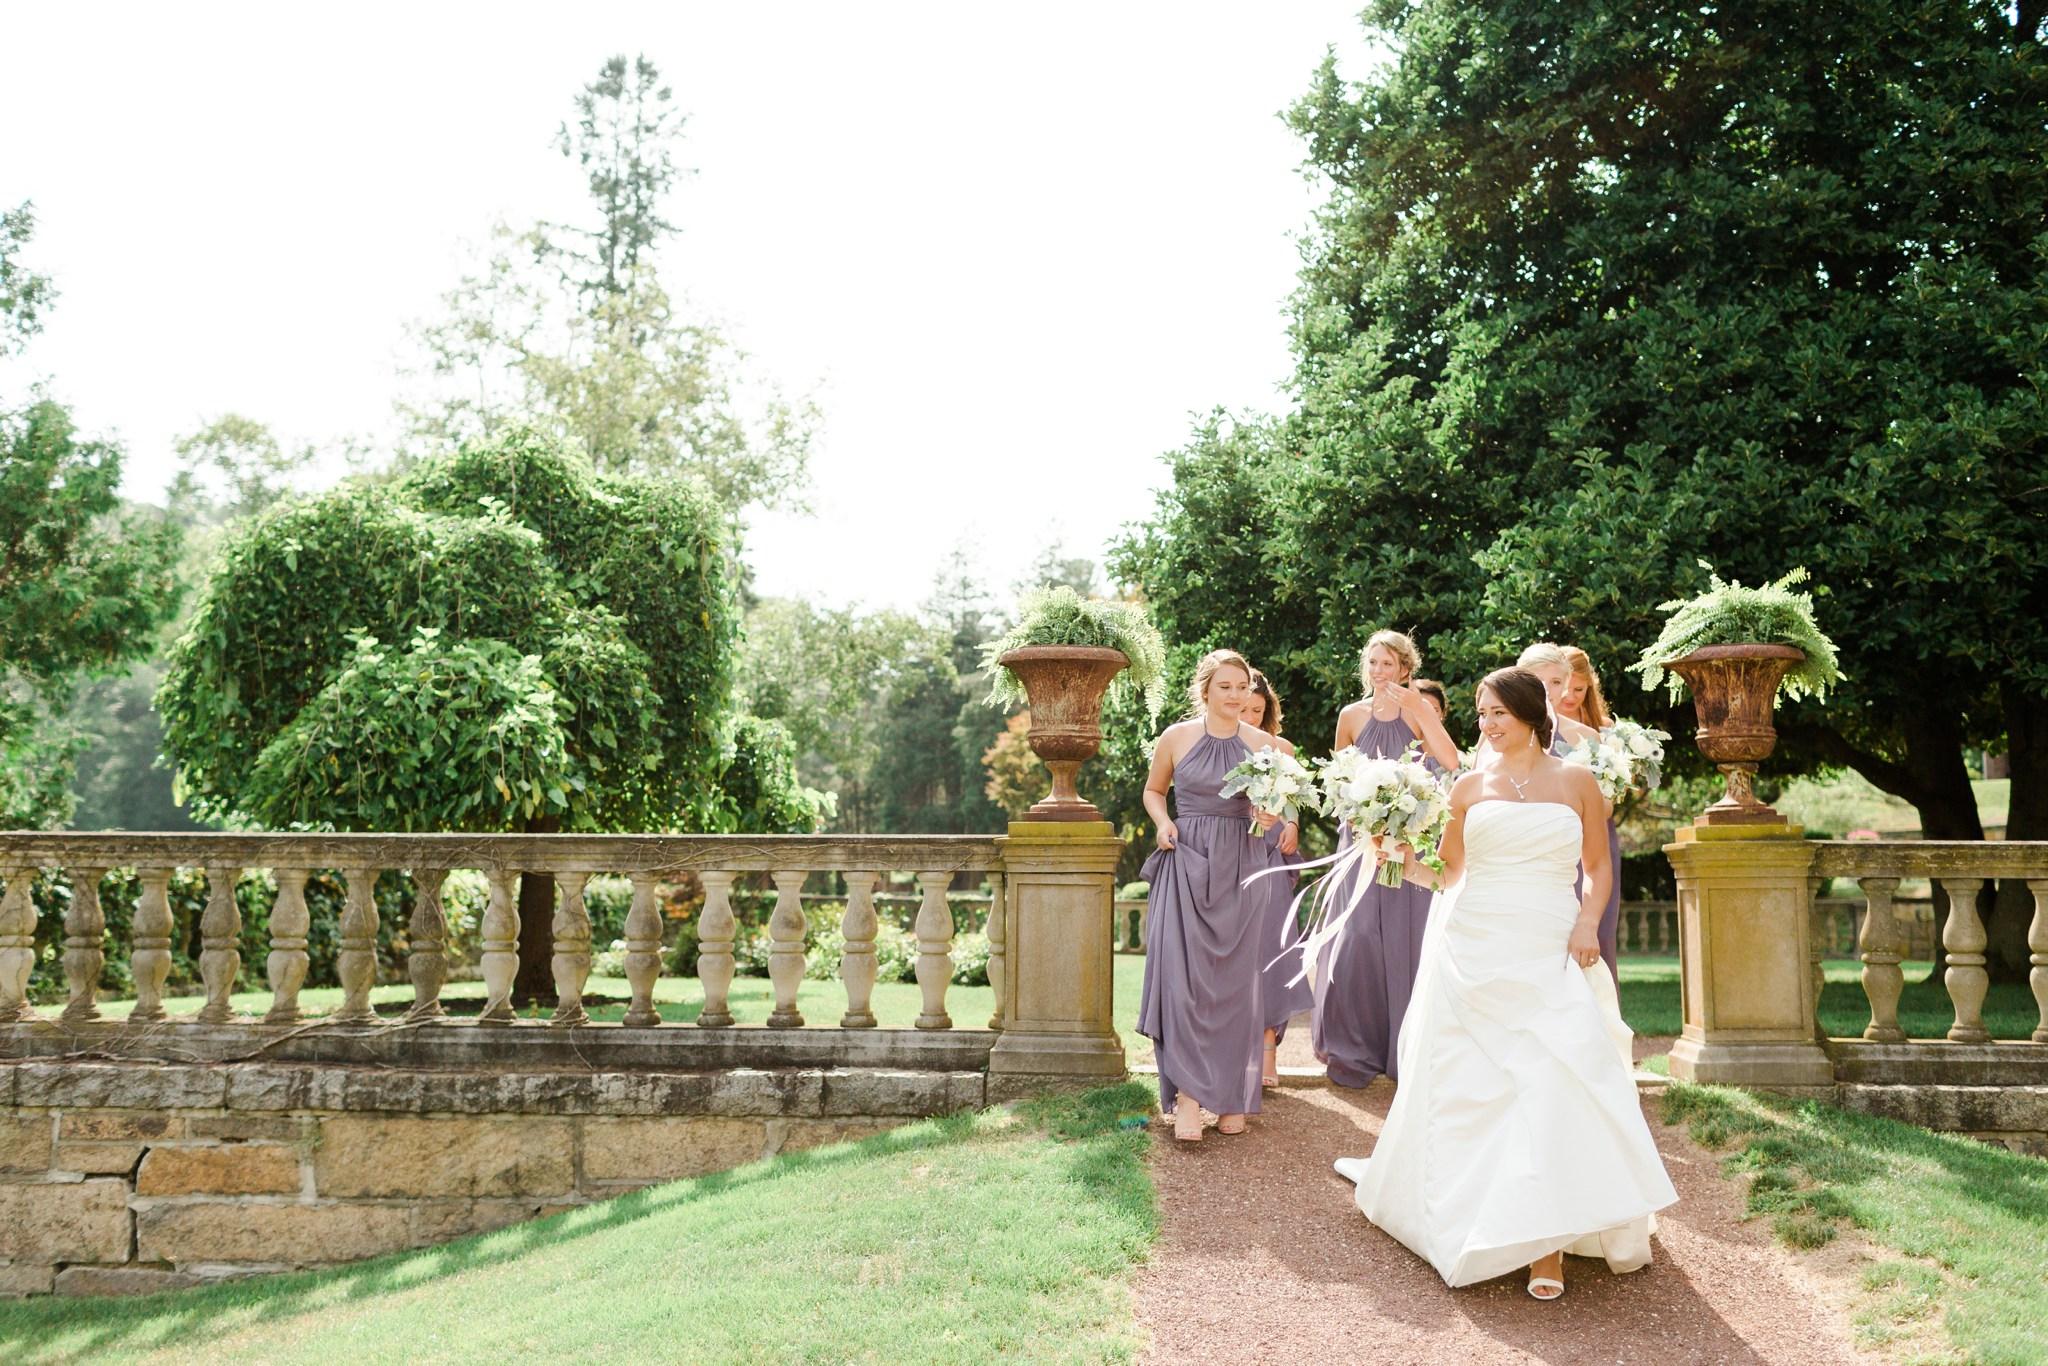 turner_hill_wedding_photos_00025.JPG